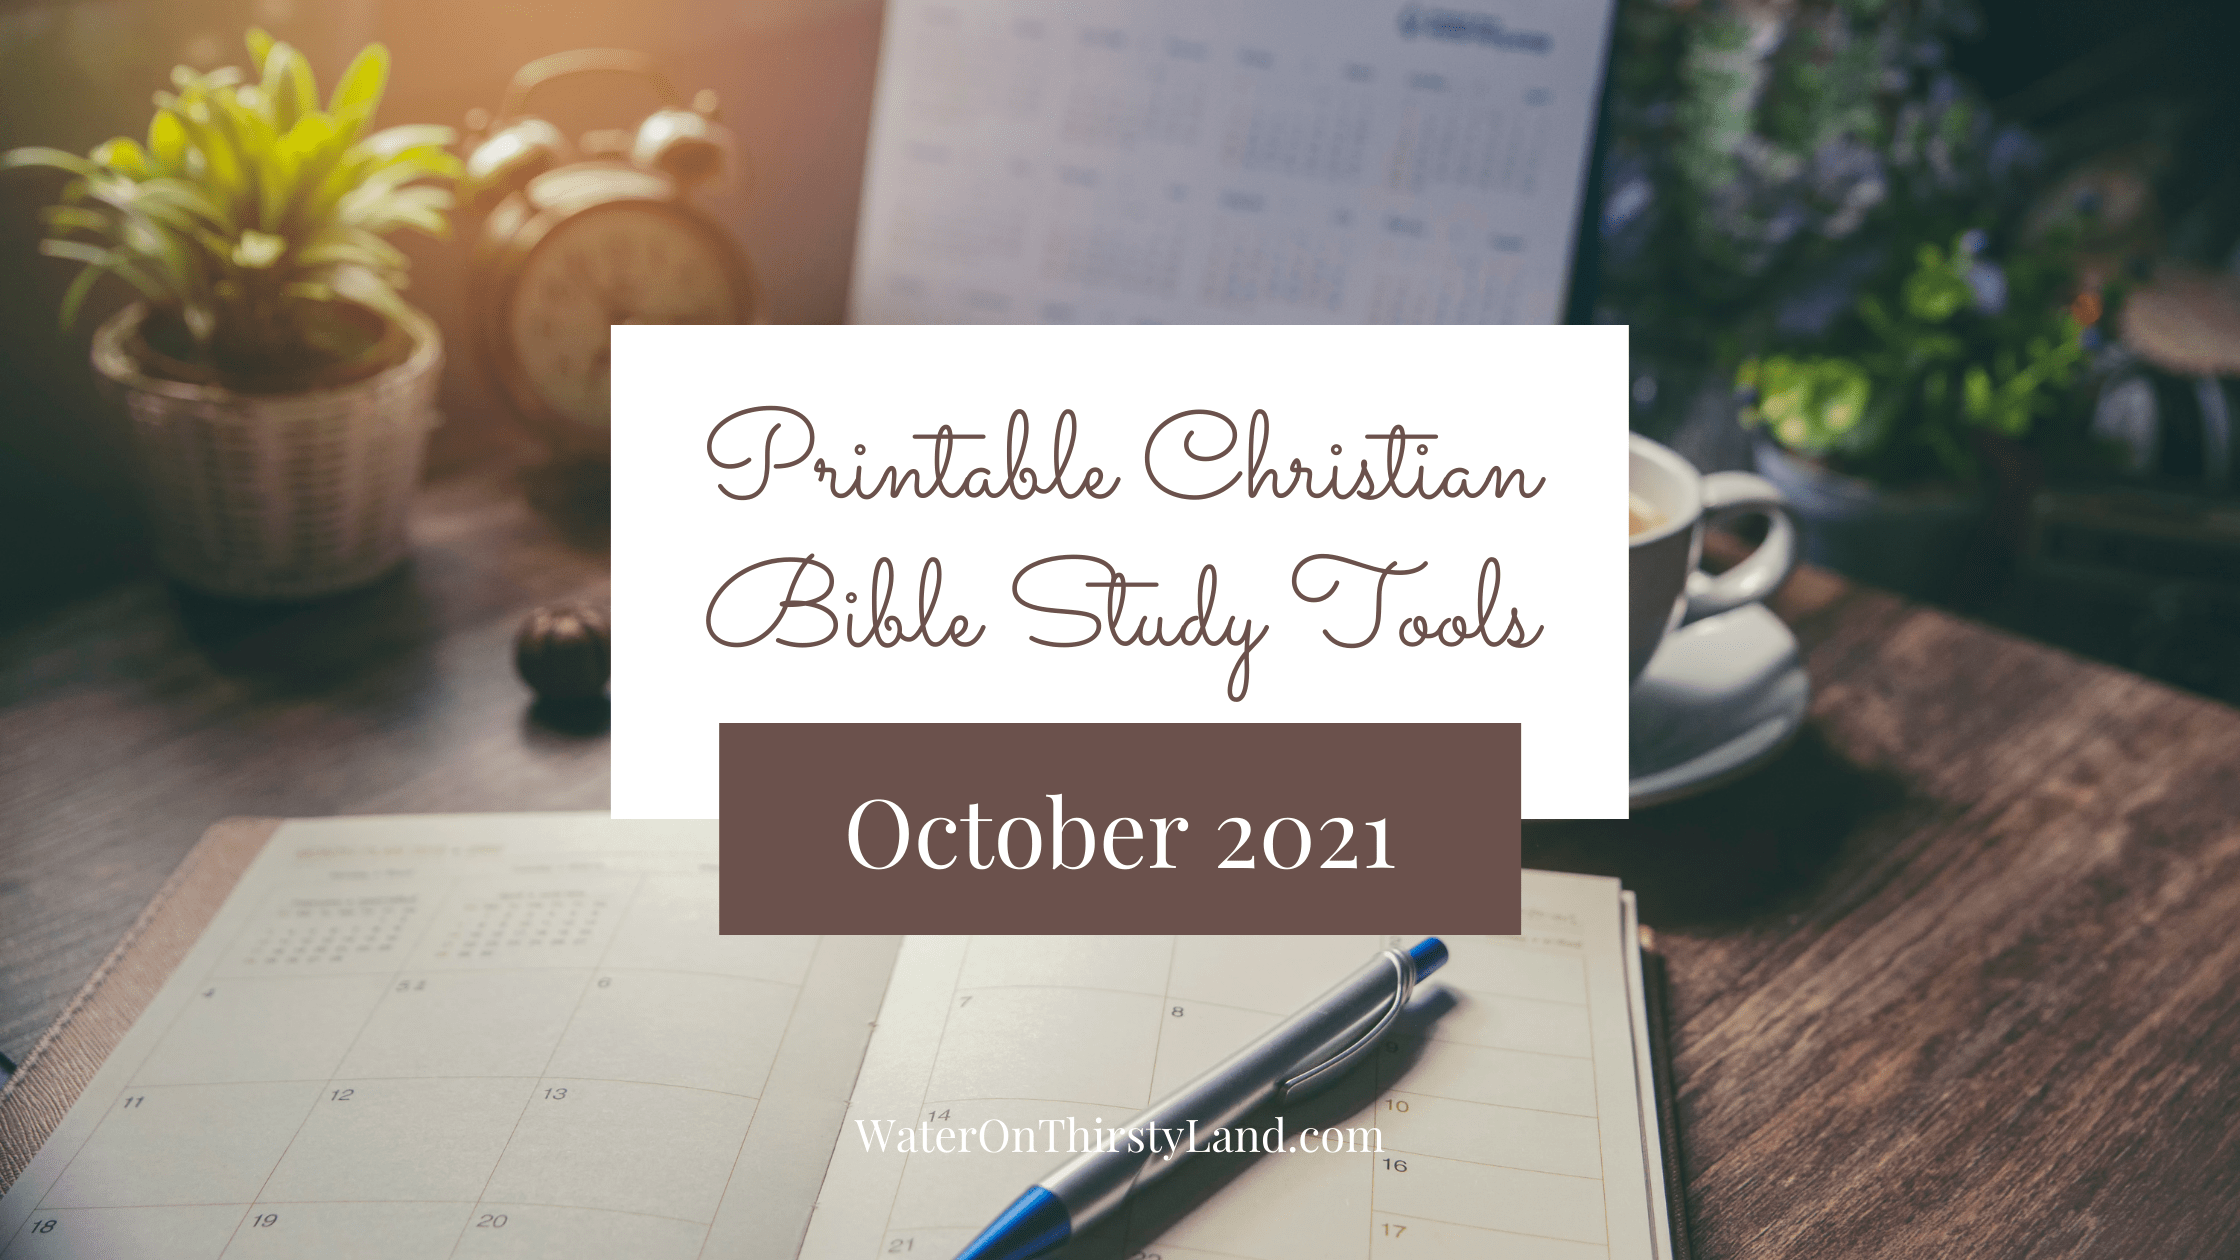 Printable Christian Bible Study Tools October 2021